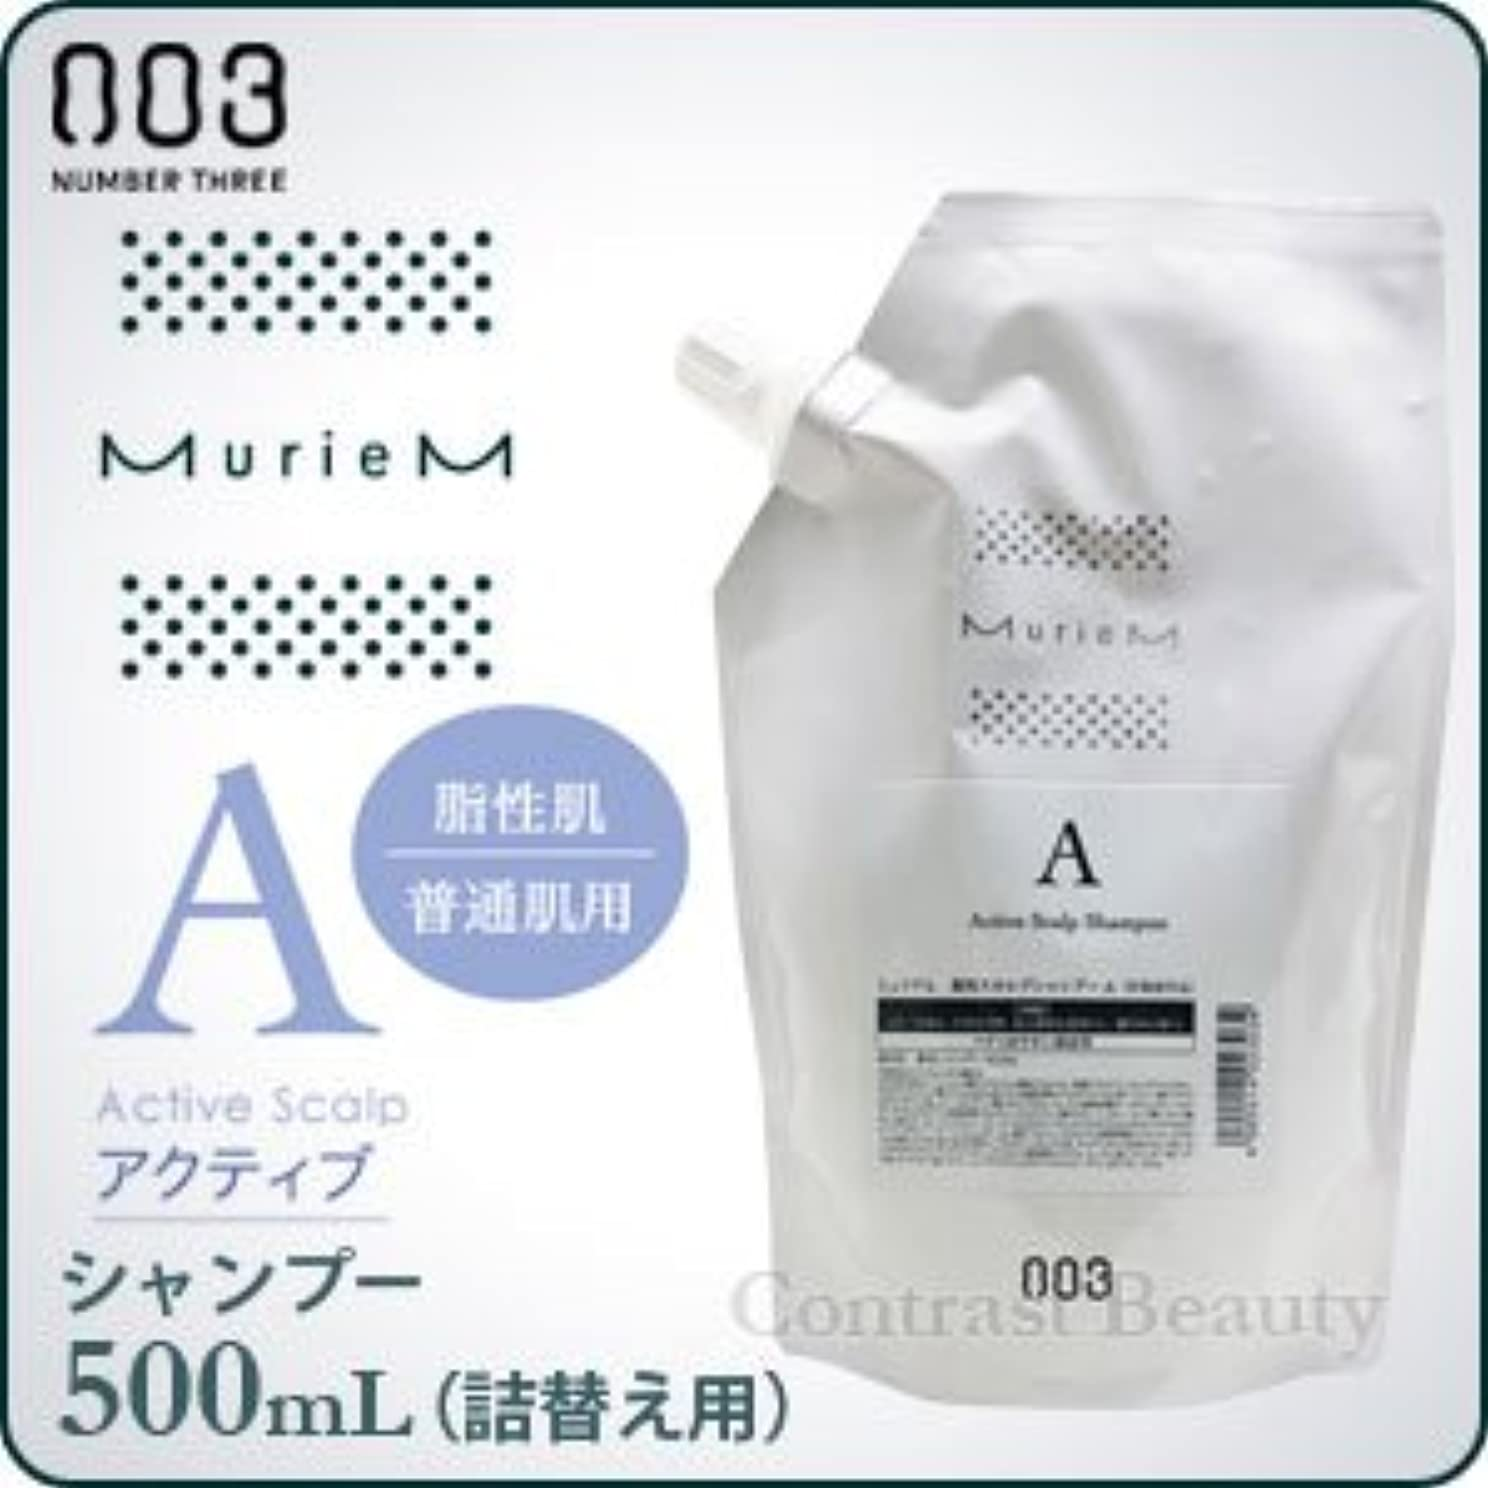 【x5個セット】 ナンバースリー ミュリアム クリスタル 薬用スカルプシャンプー A 500ml 詰替え用 医薬部外品